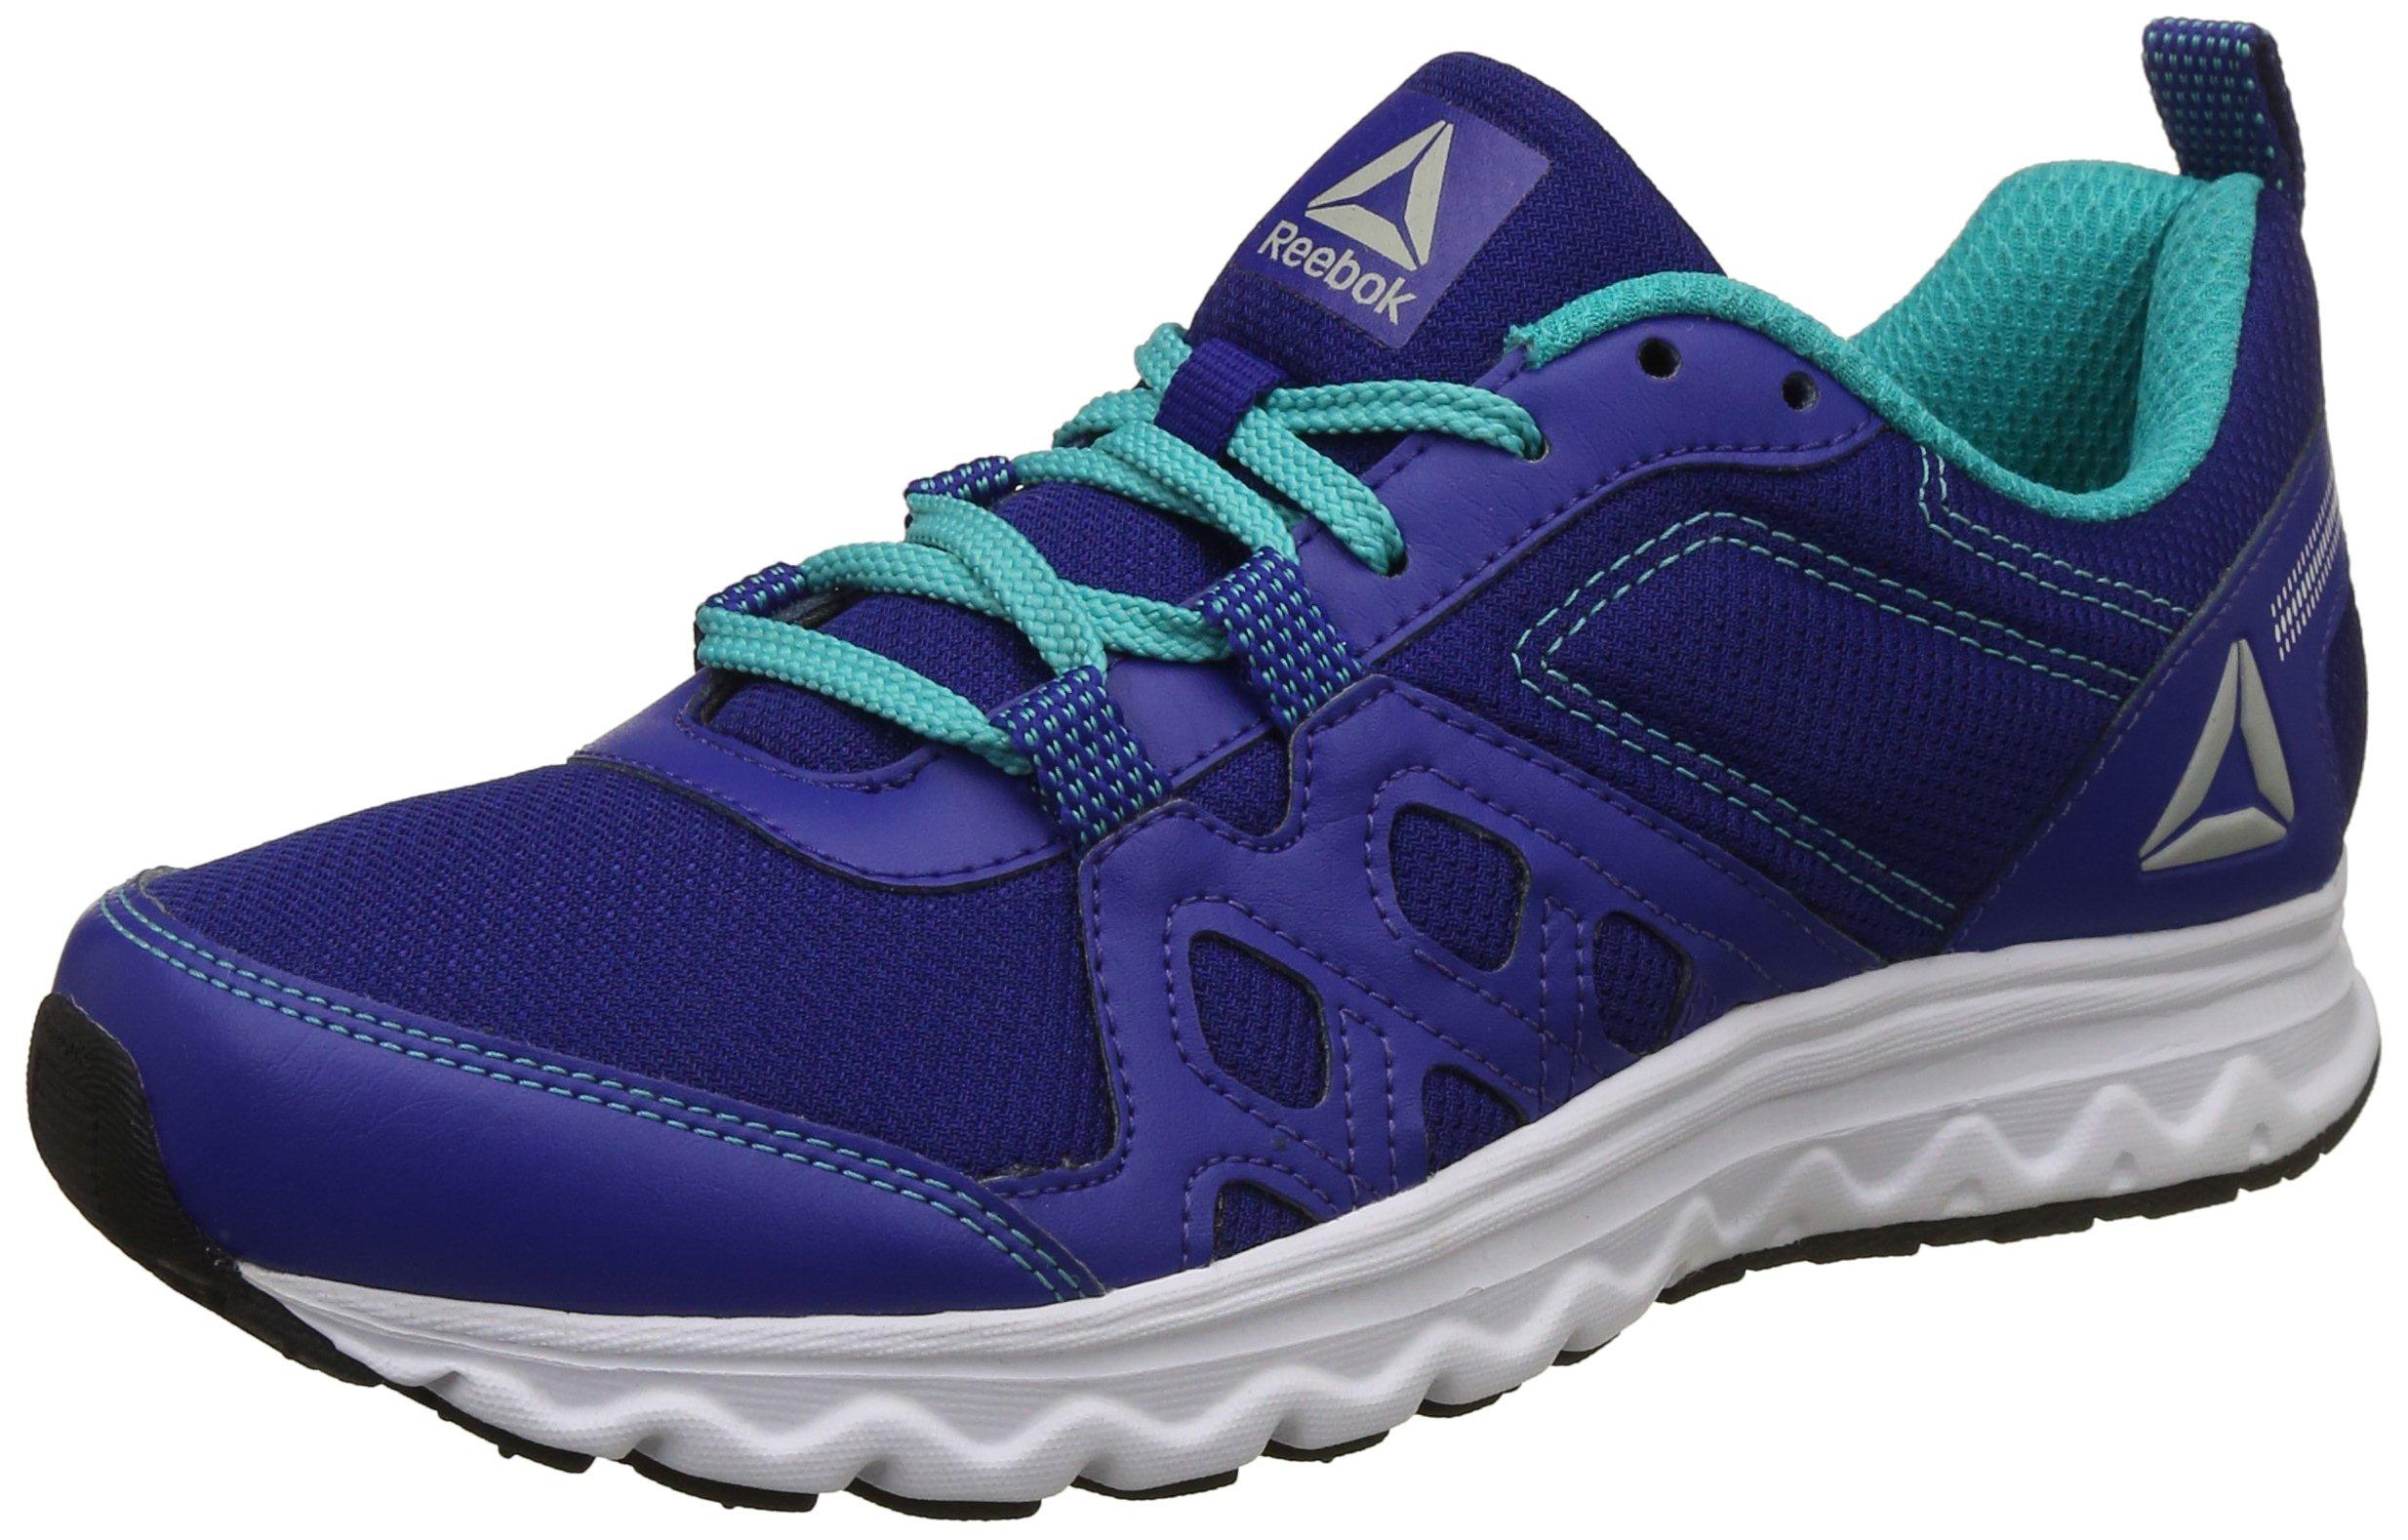 Reebok Women's Fusion Xtreme Running Shoes